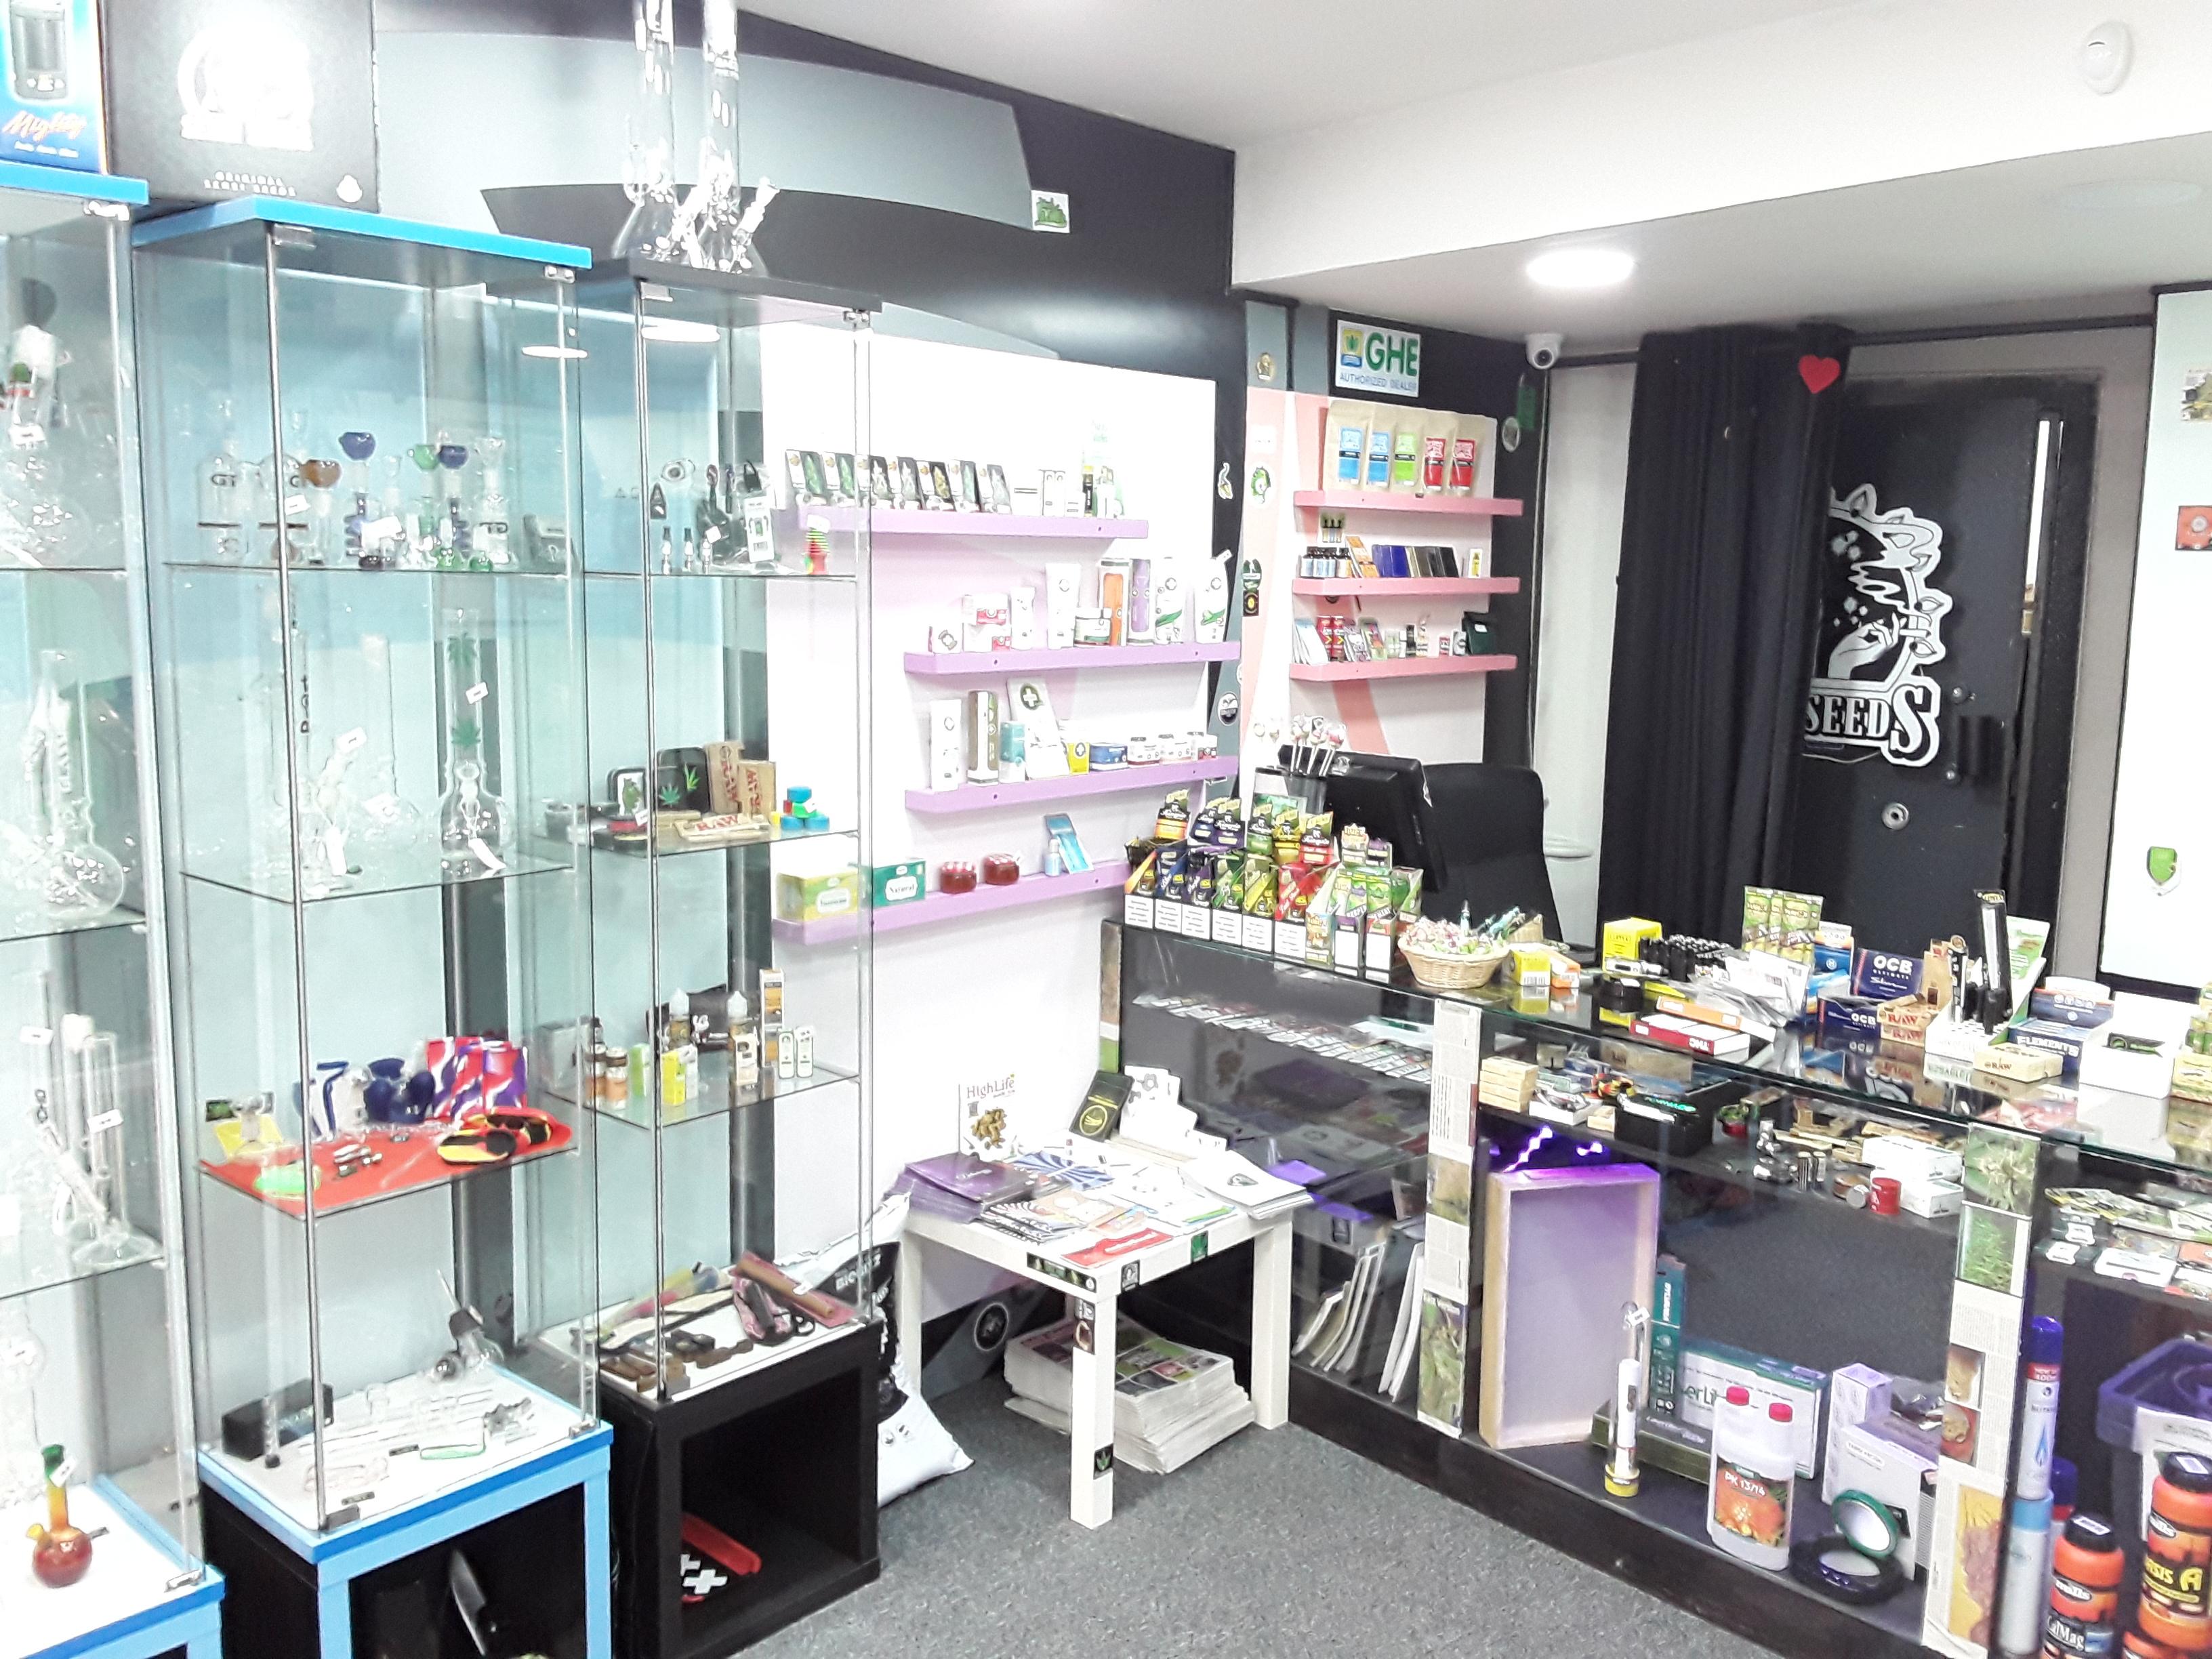 Pajarraco - Headshop & Seedbank